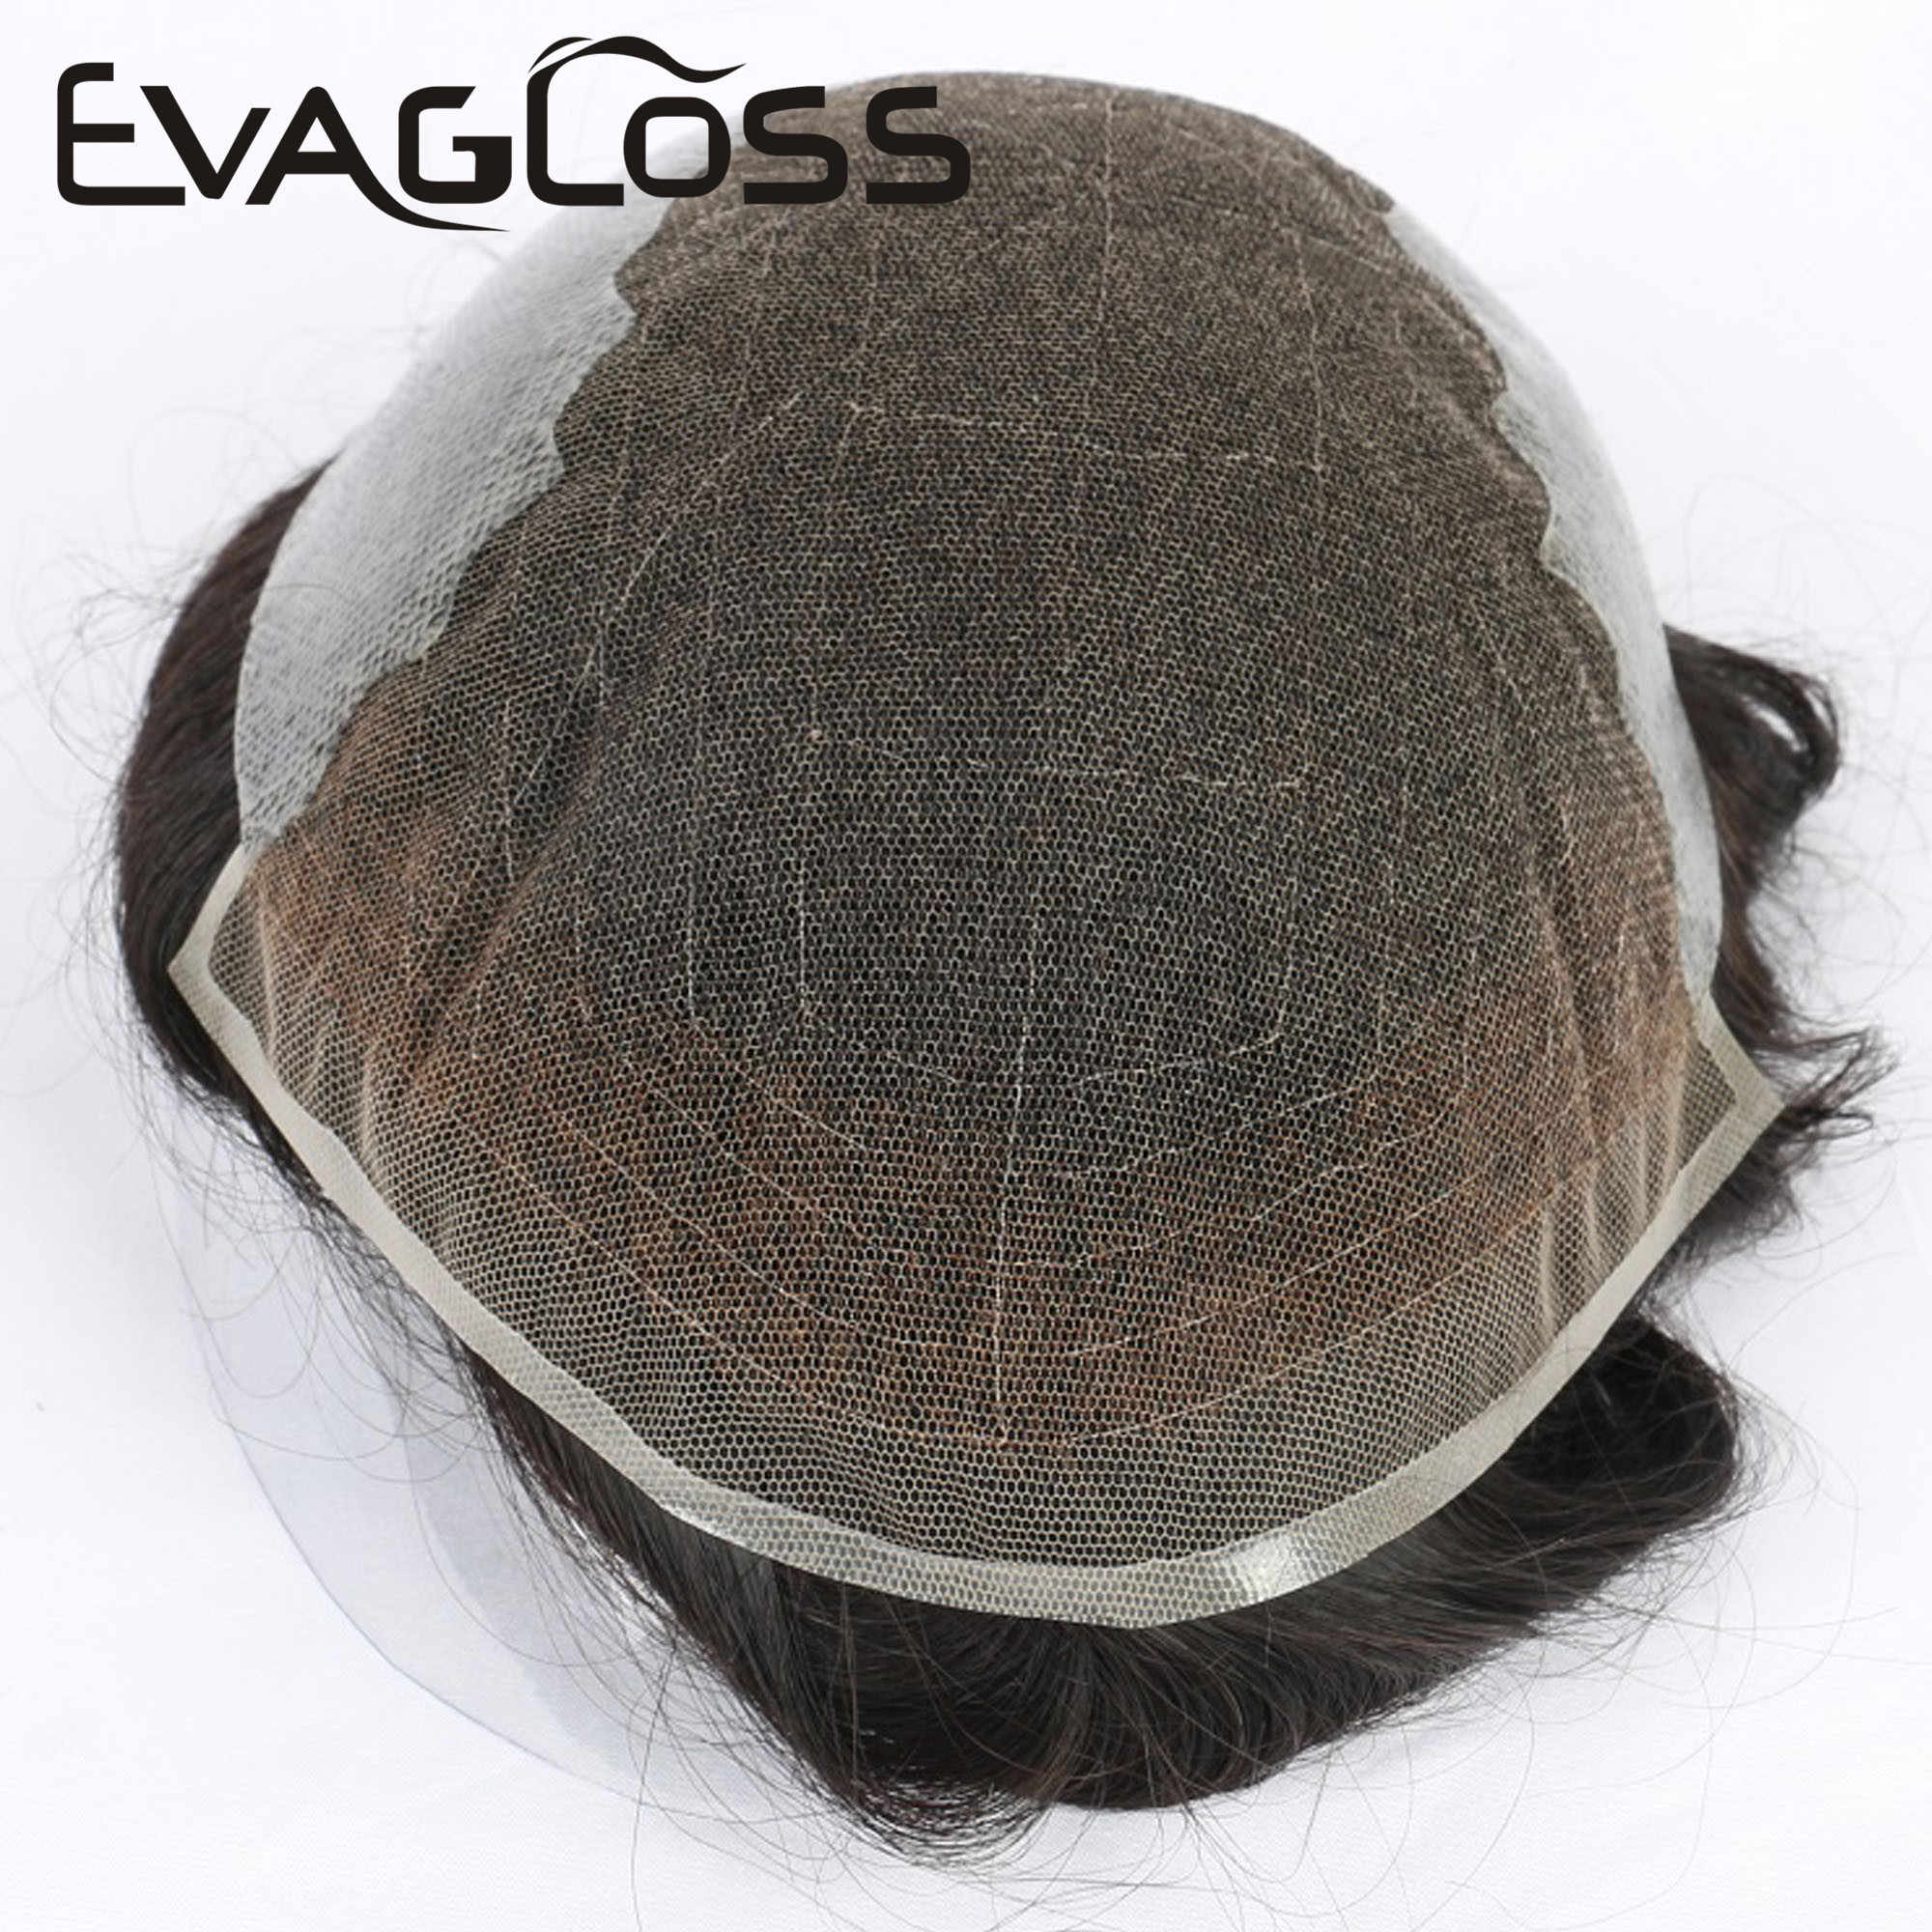 EVAGLOSS Mens Toupee 남자를위한 튼튼한 프랑스 레이스 얇은 PU 보충 머리 체계 Q6 작풍 Toupee 체계 인간적인 머리 남자의 가발